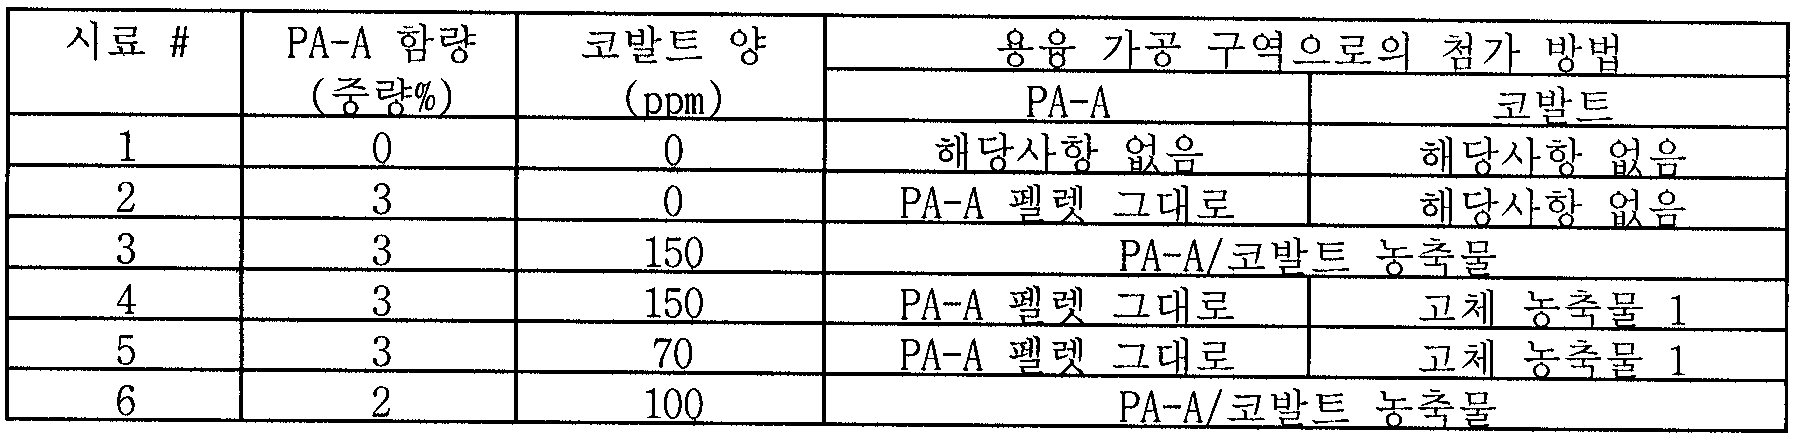 Figure 112007041122157-PCT00004